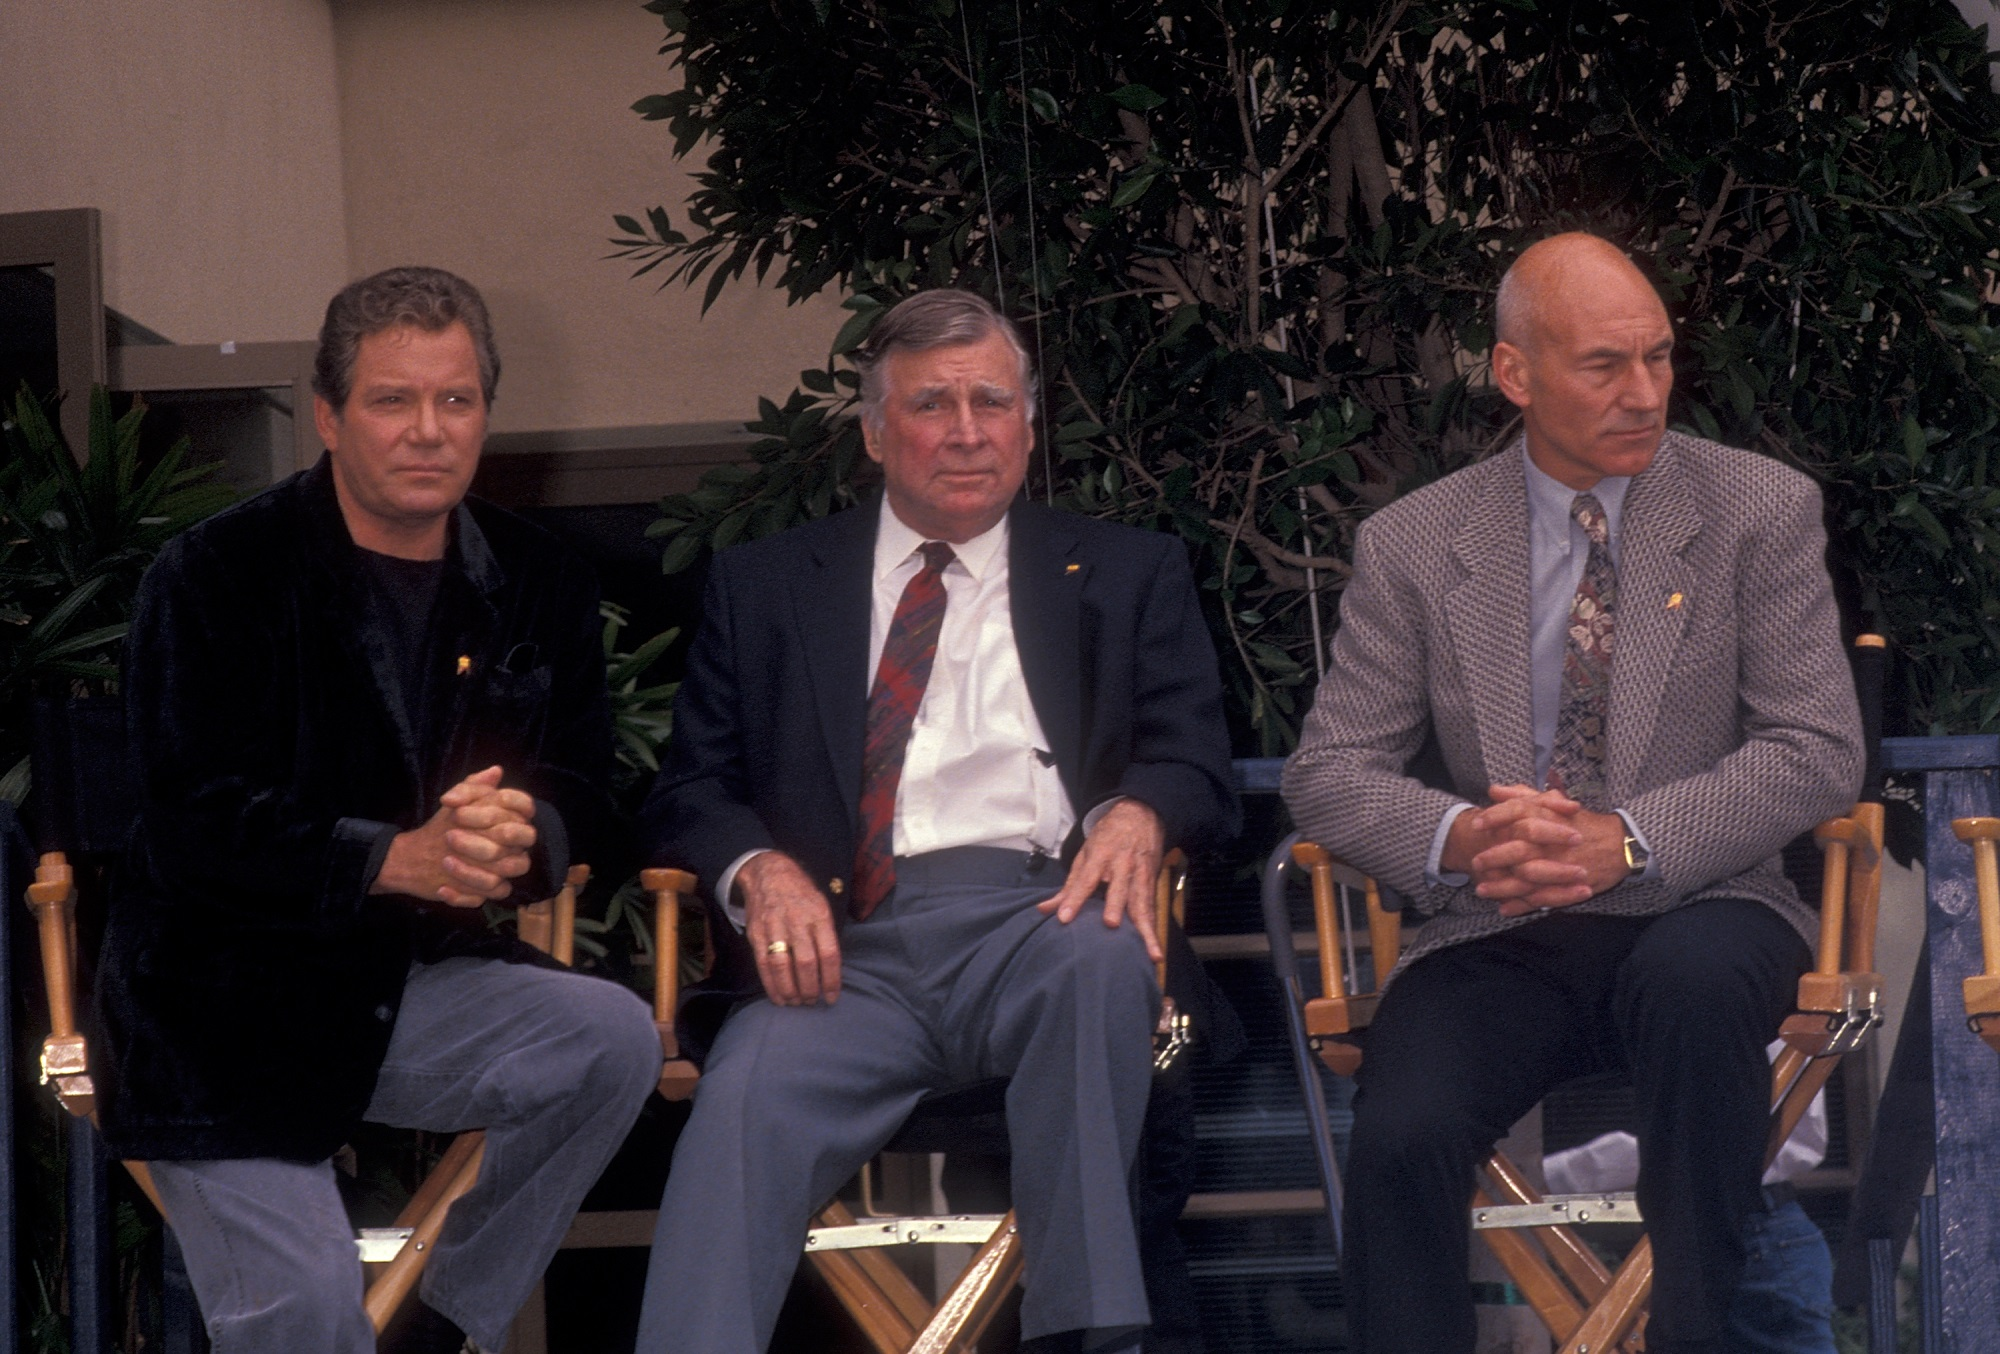 William Shatner, Gene Roddenberry, and Patrick Stewart of Star Trek